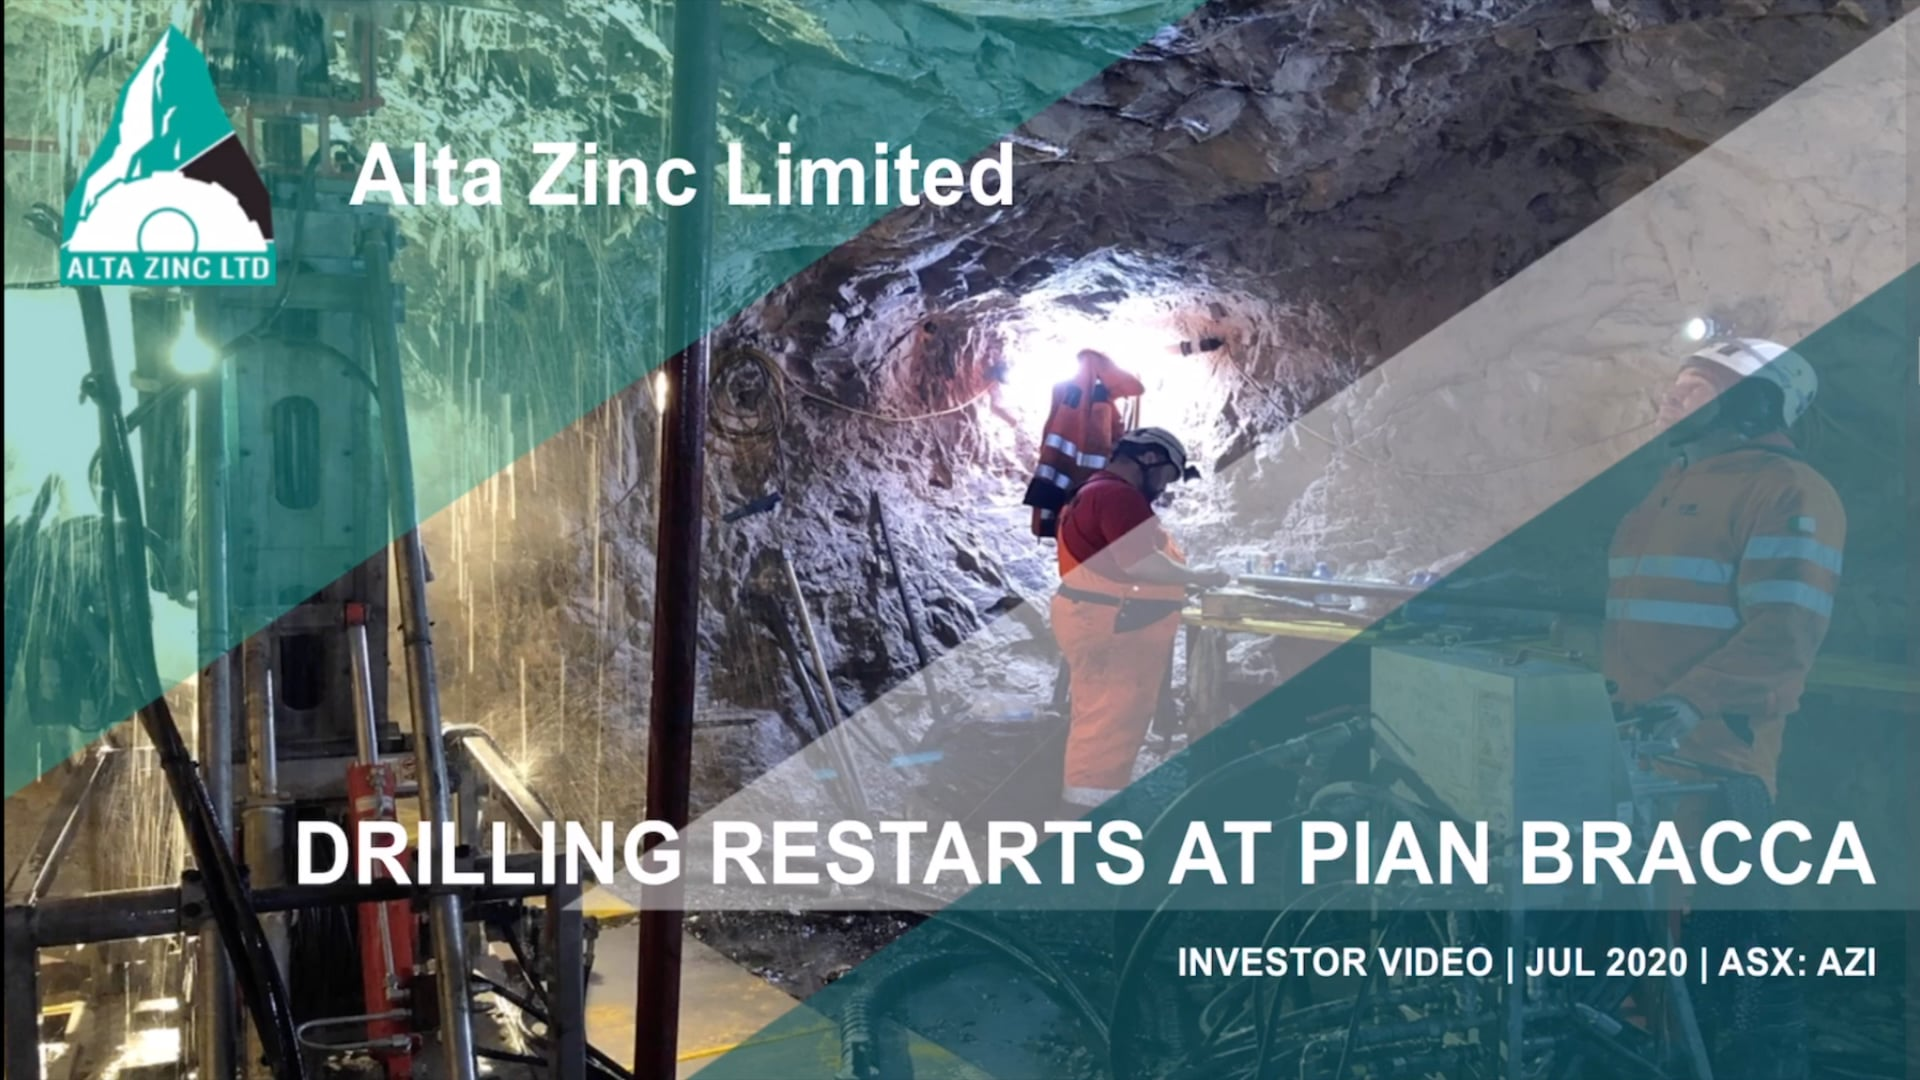 Alta Zinc: Drilling Restarts at Pian Bracca